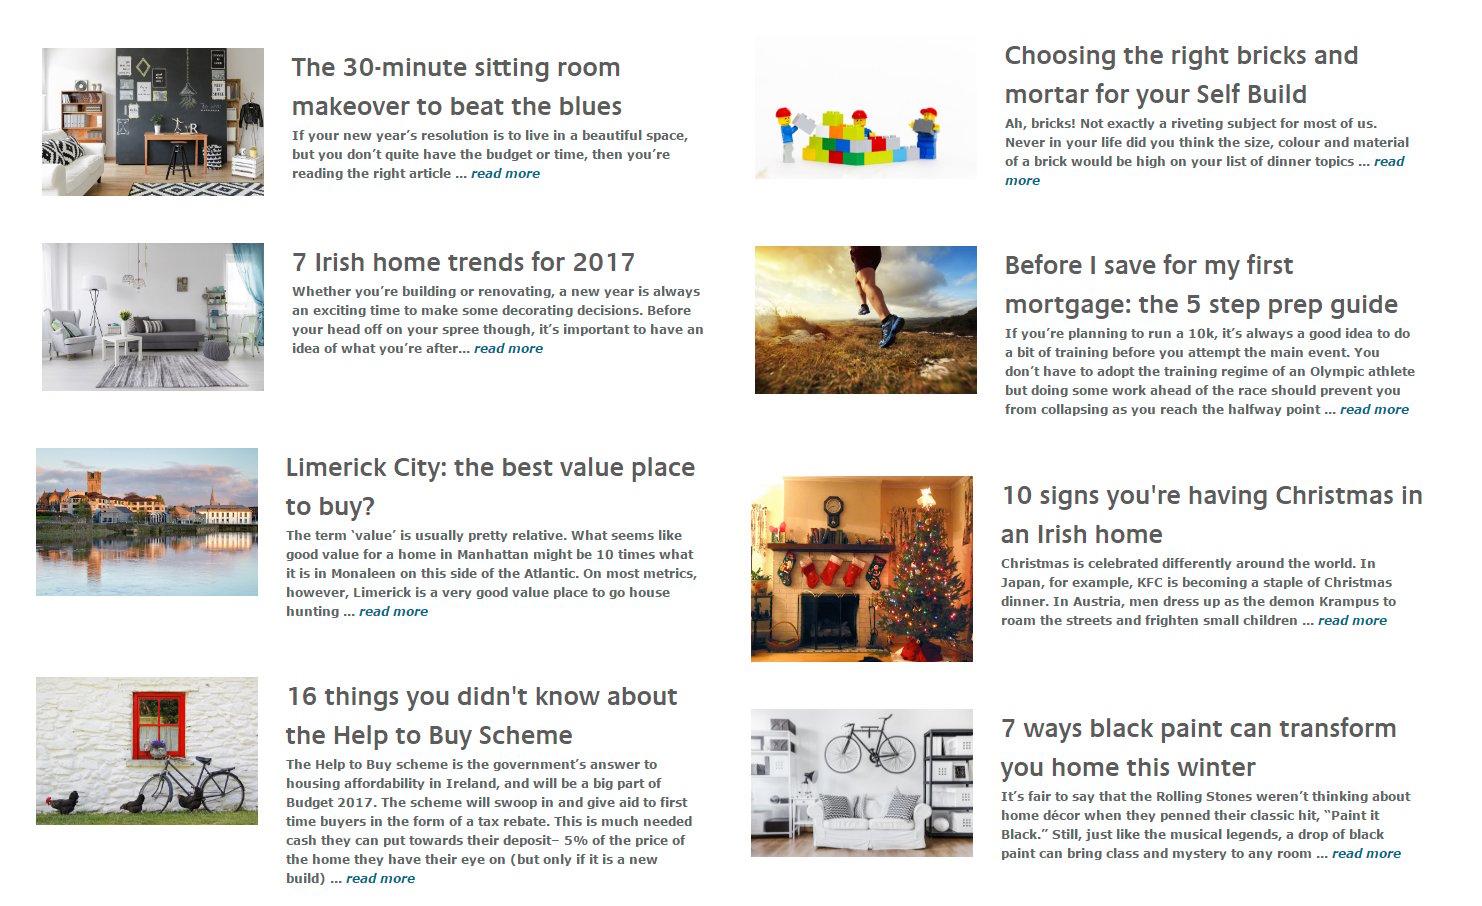 boring content industry vertical